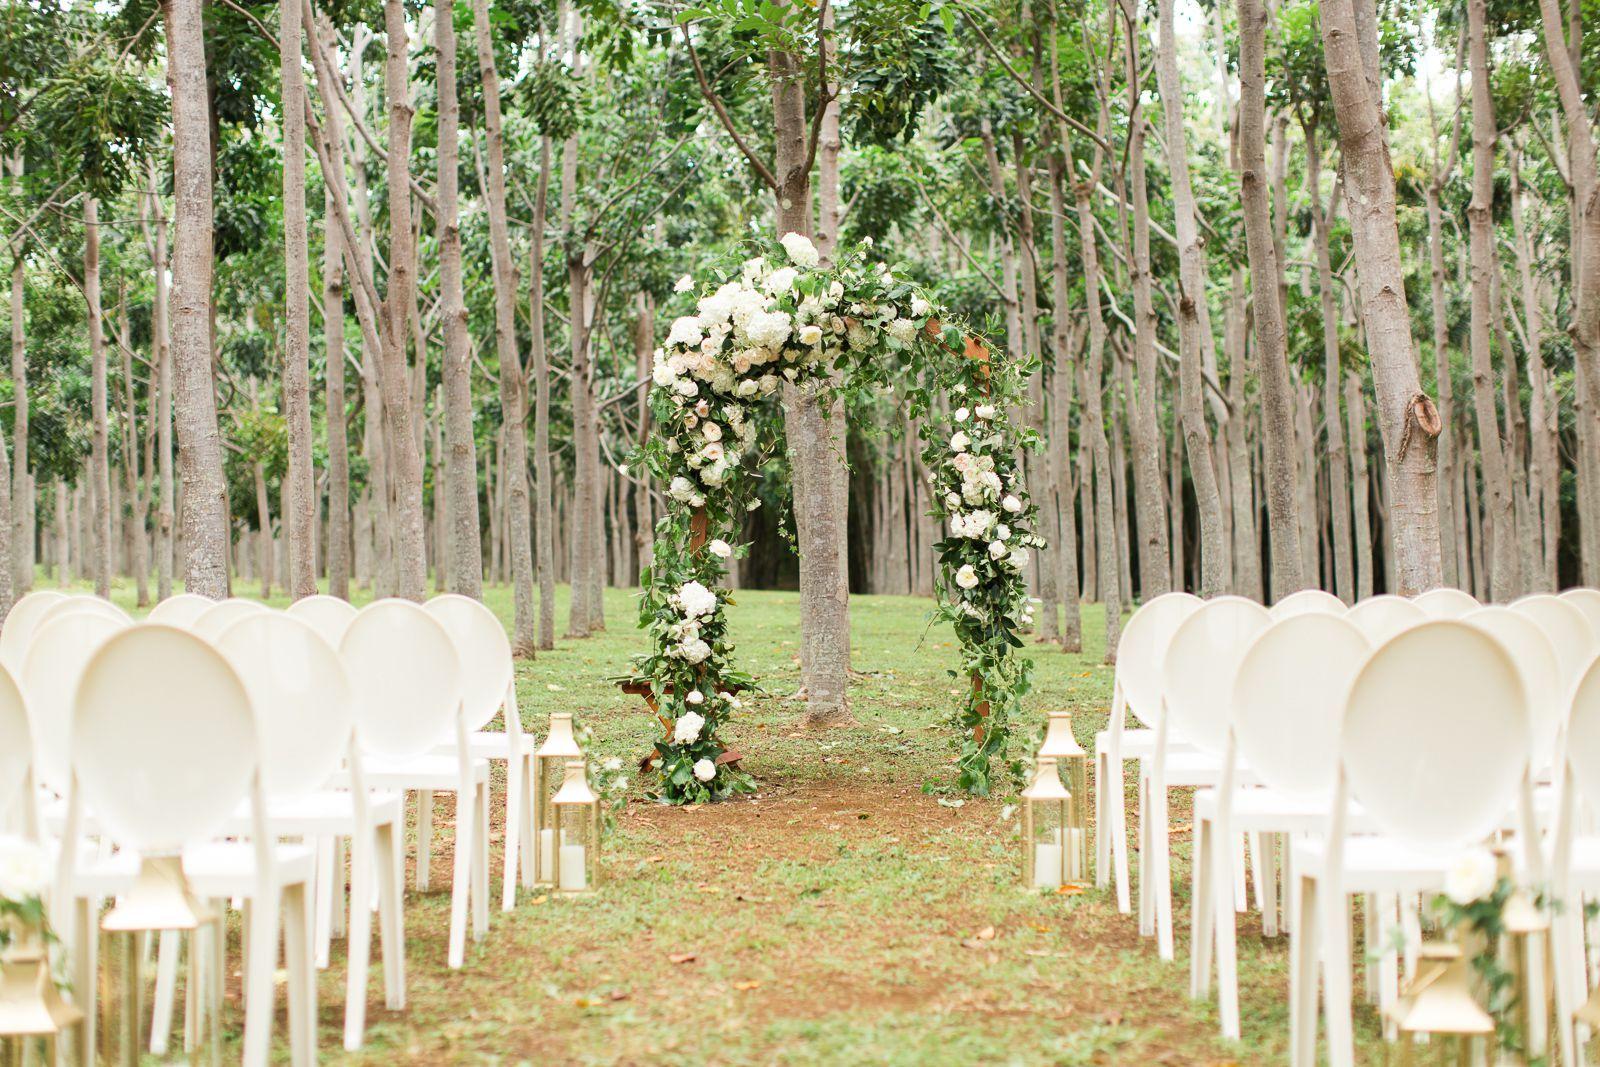 44 outdoor wedding ideas decorations for a fun outside spring wedding rh countryliving com  summer outdoor wedding centerpiece ideas